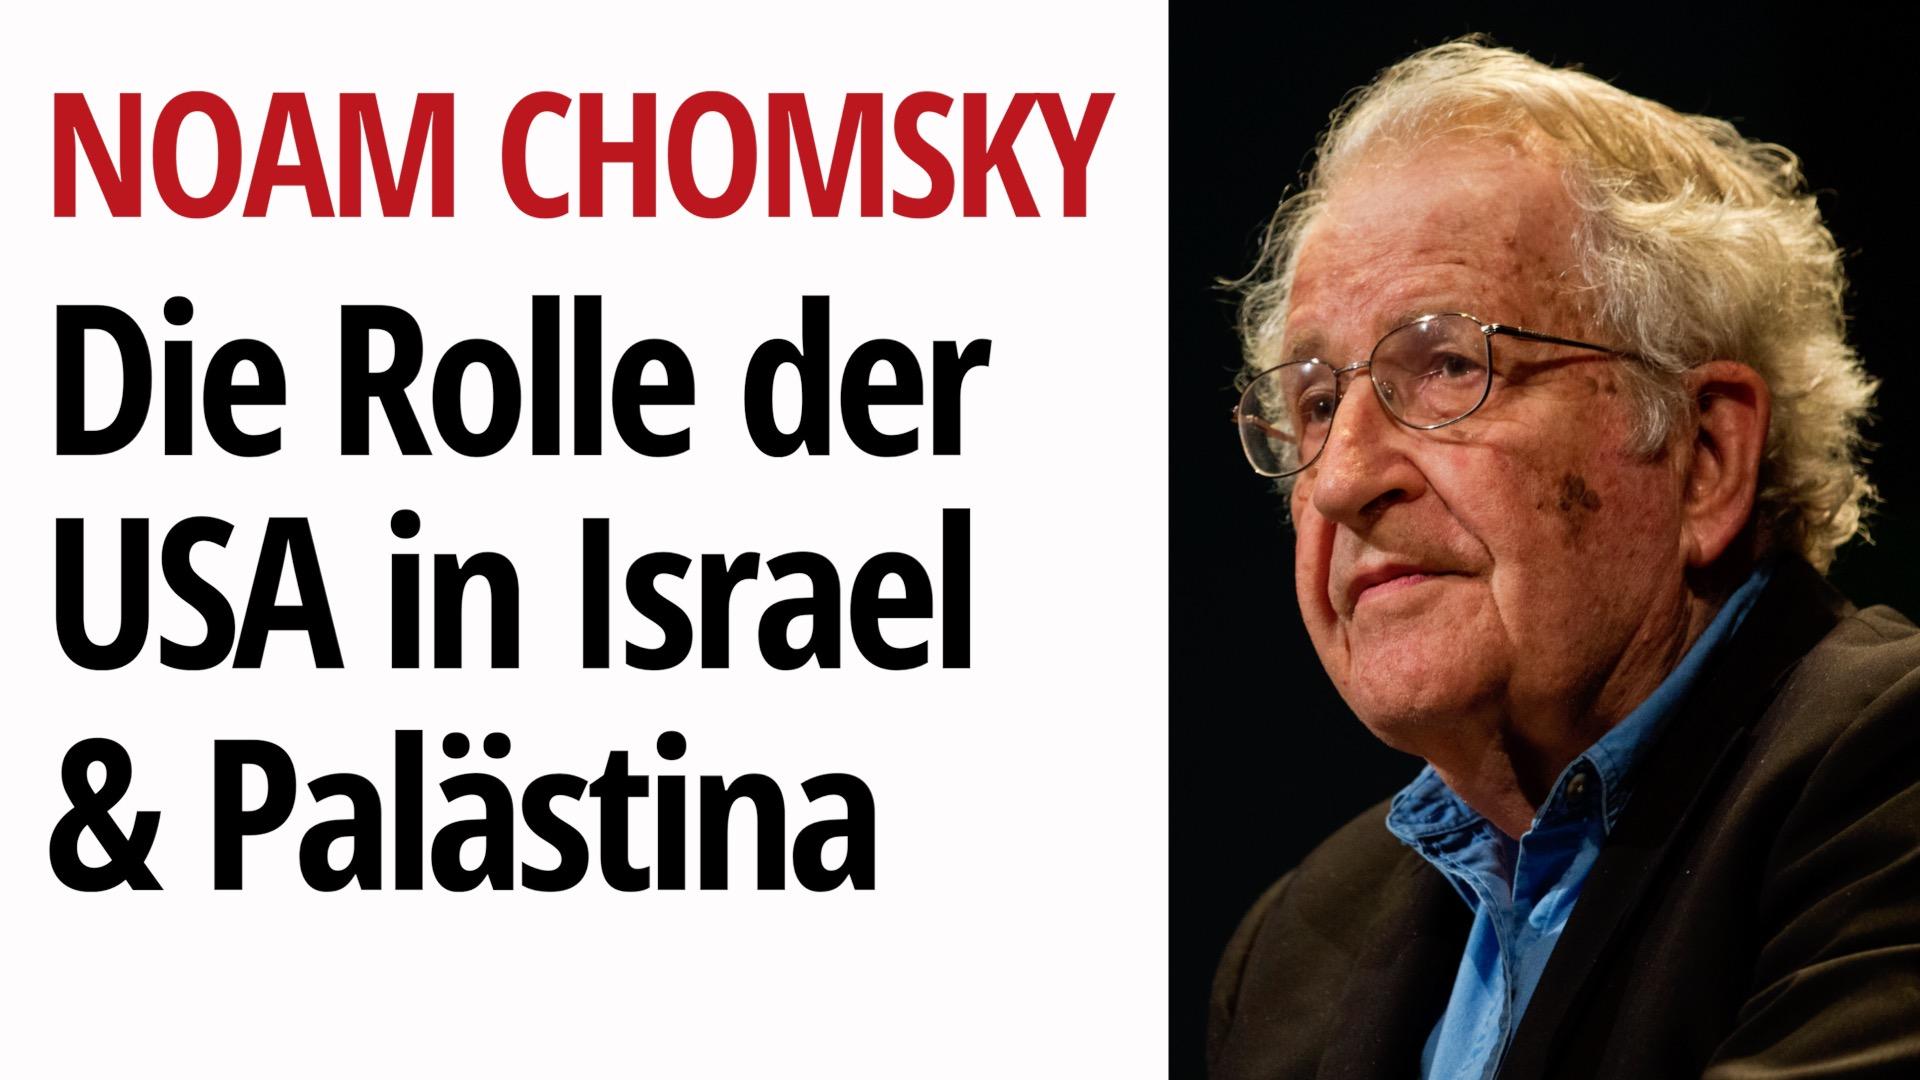 Chomsky: Ohne US Hilfe würde Israel nicht massenhaft Palästinenser töten